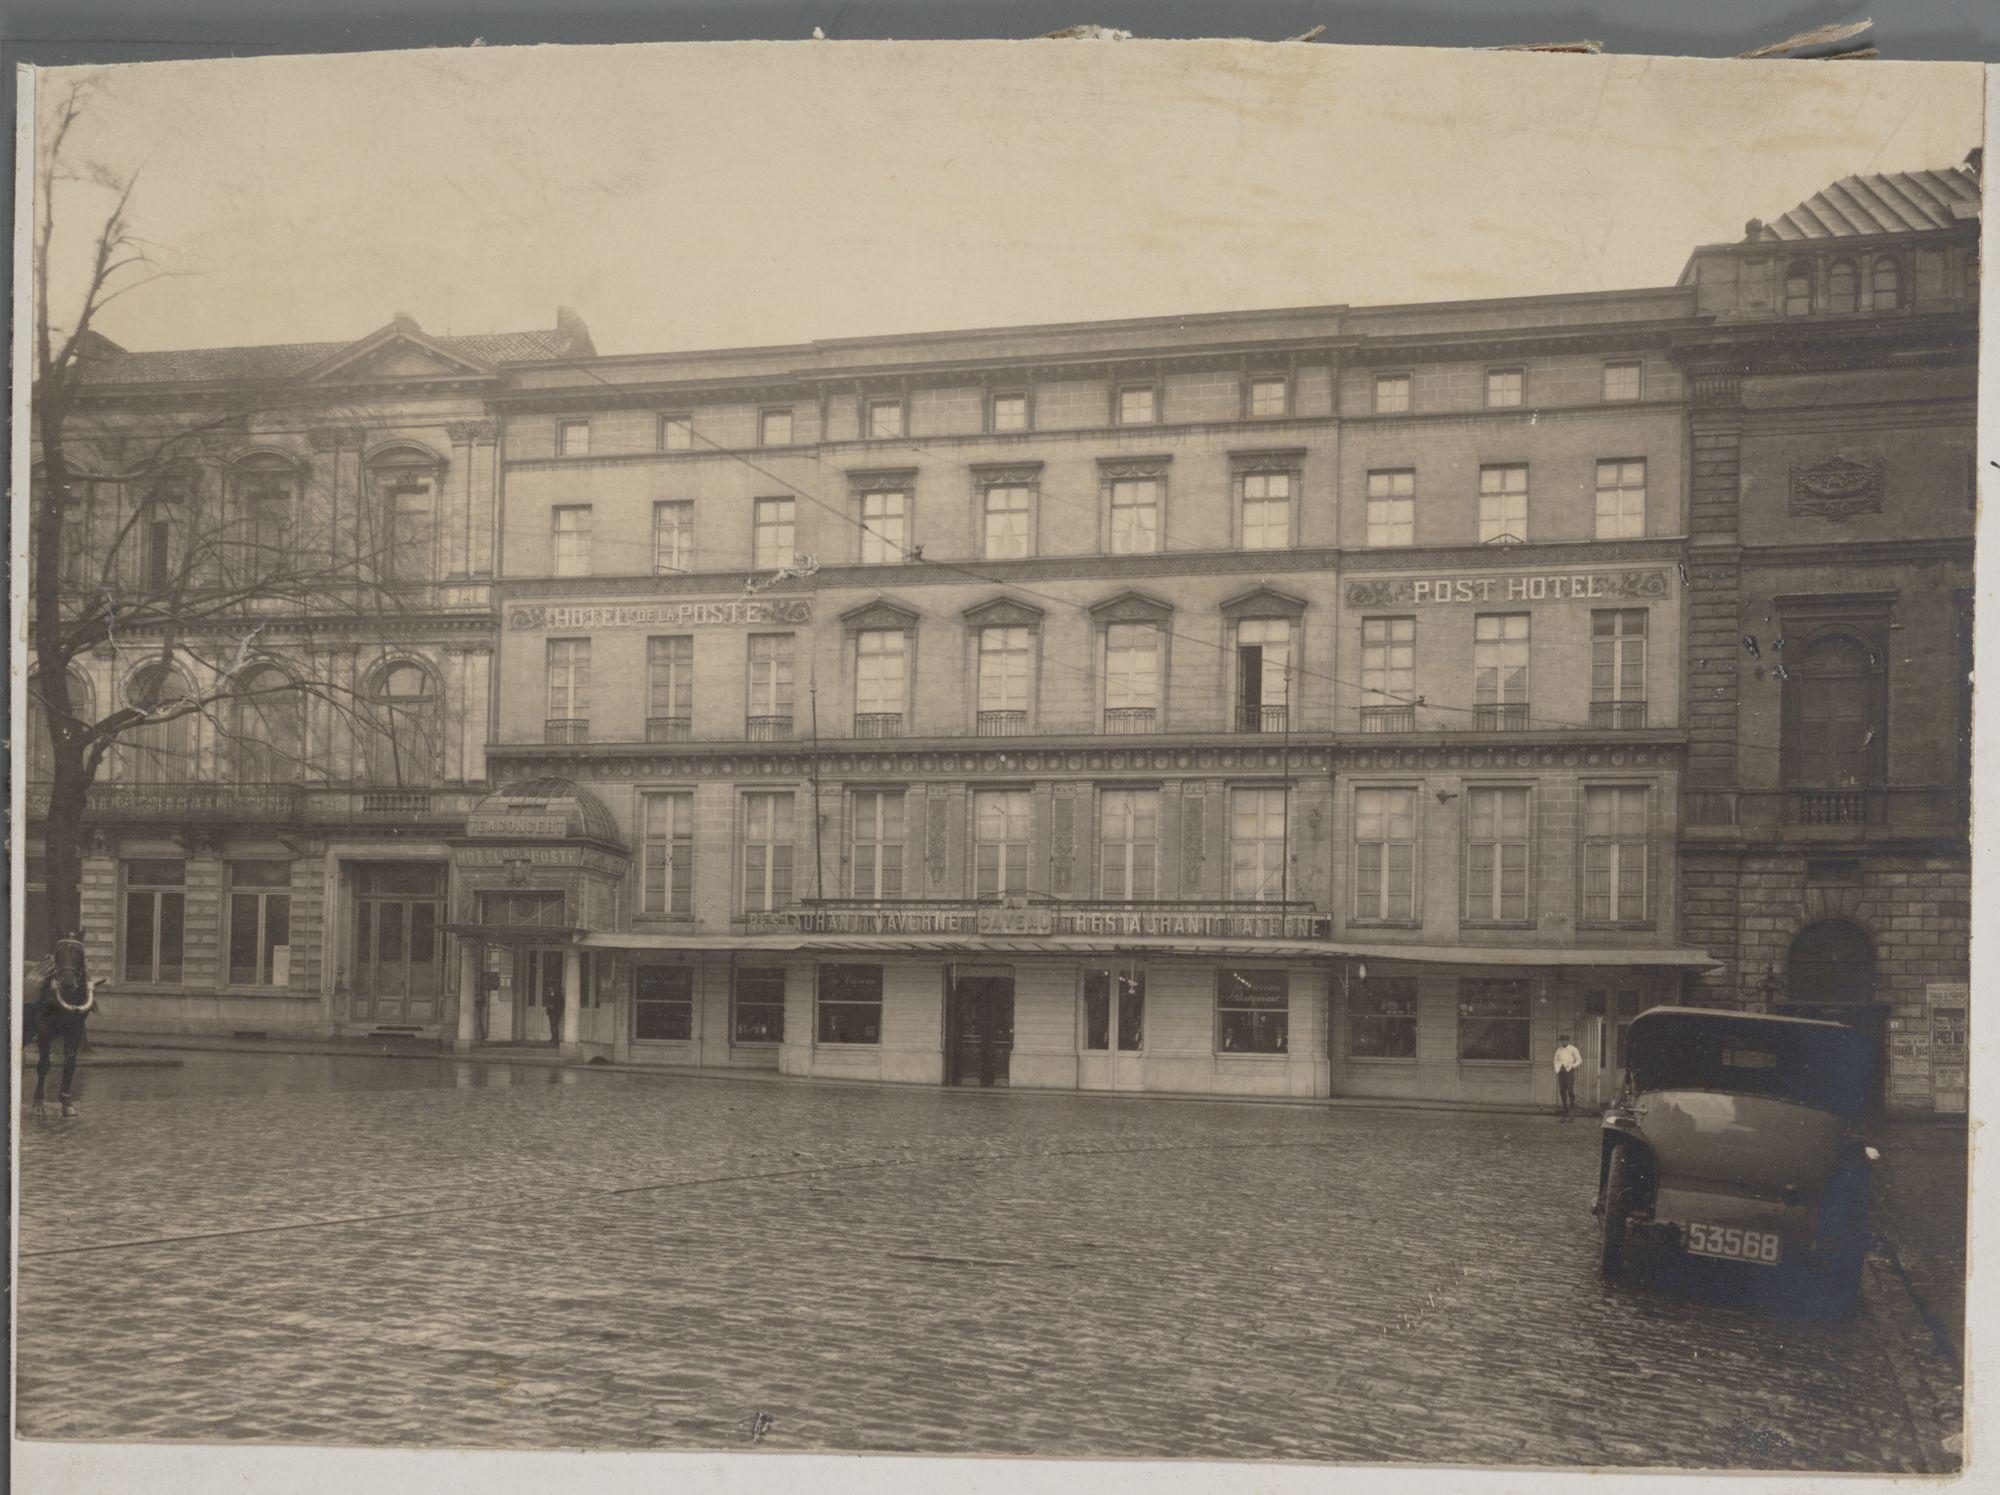 Gent: Posthotel, Kouter